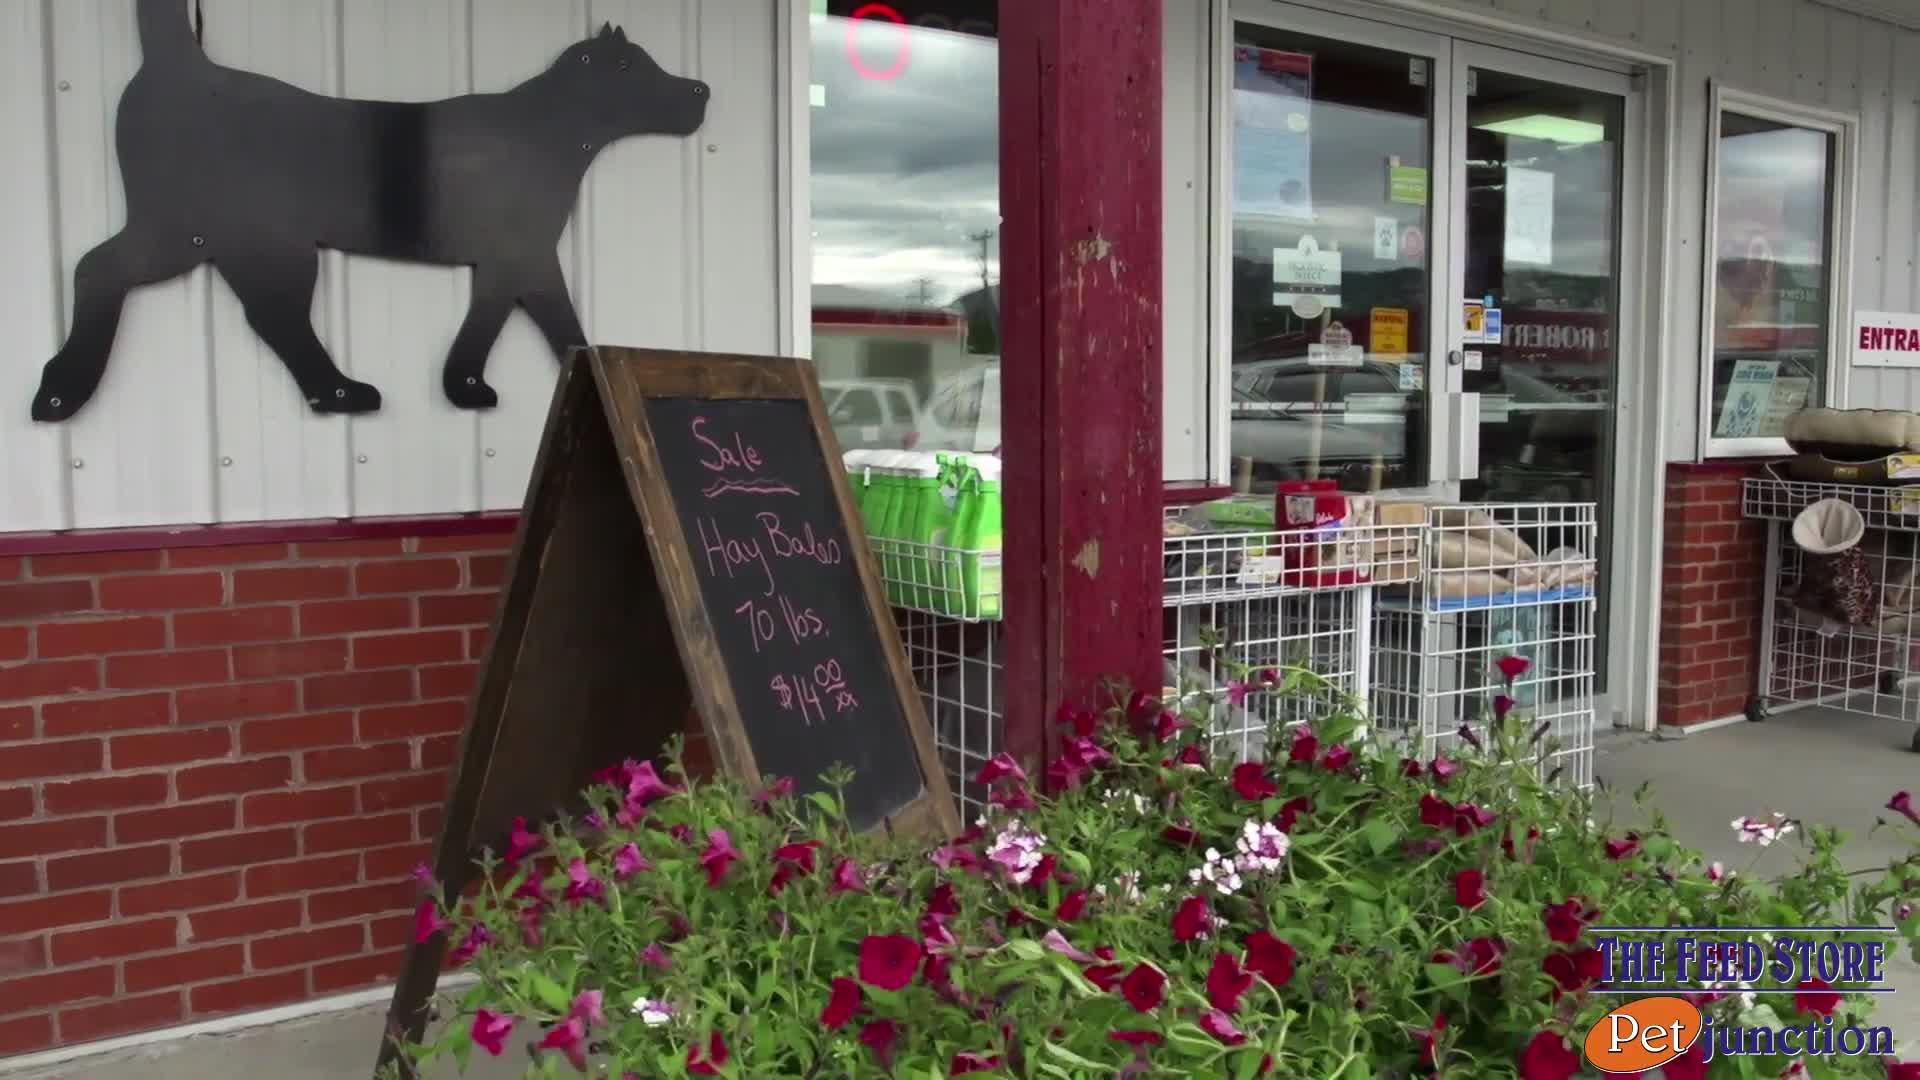 Feed Store The Pet Junction Whitehorse Yt 9006 Quartz